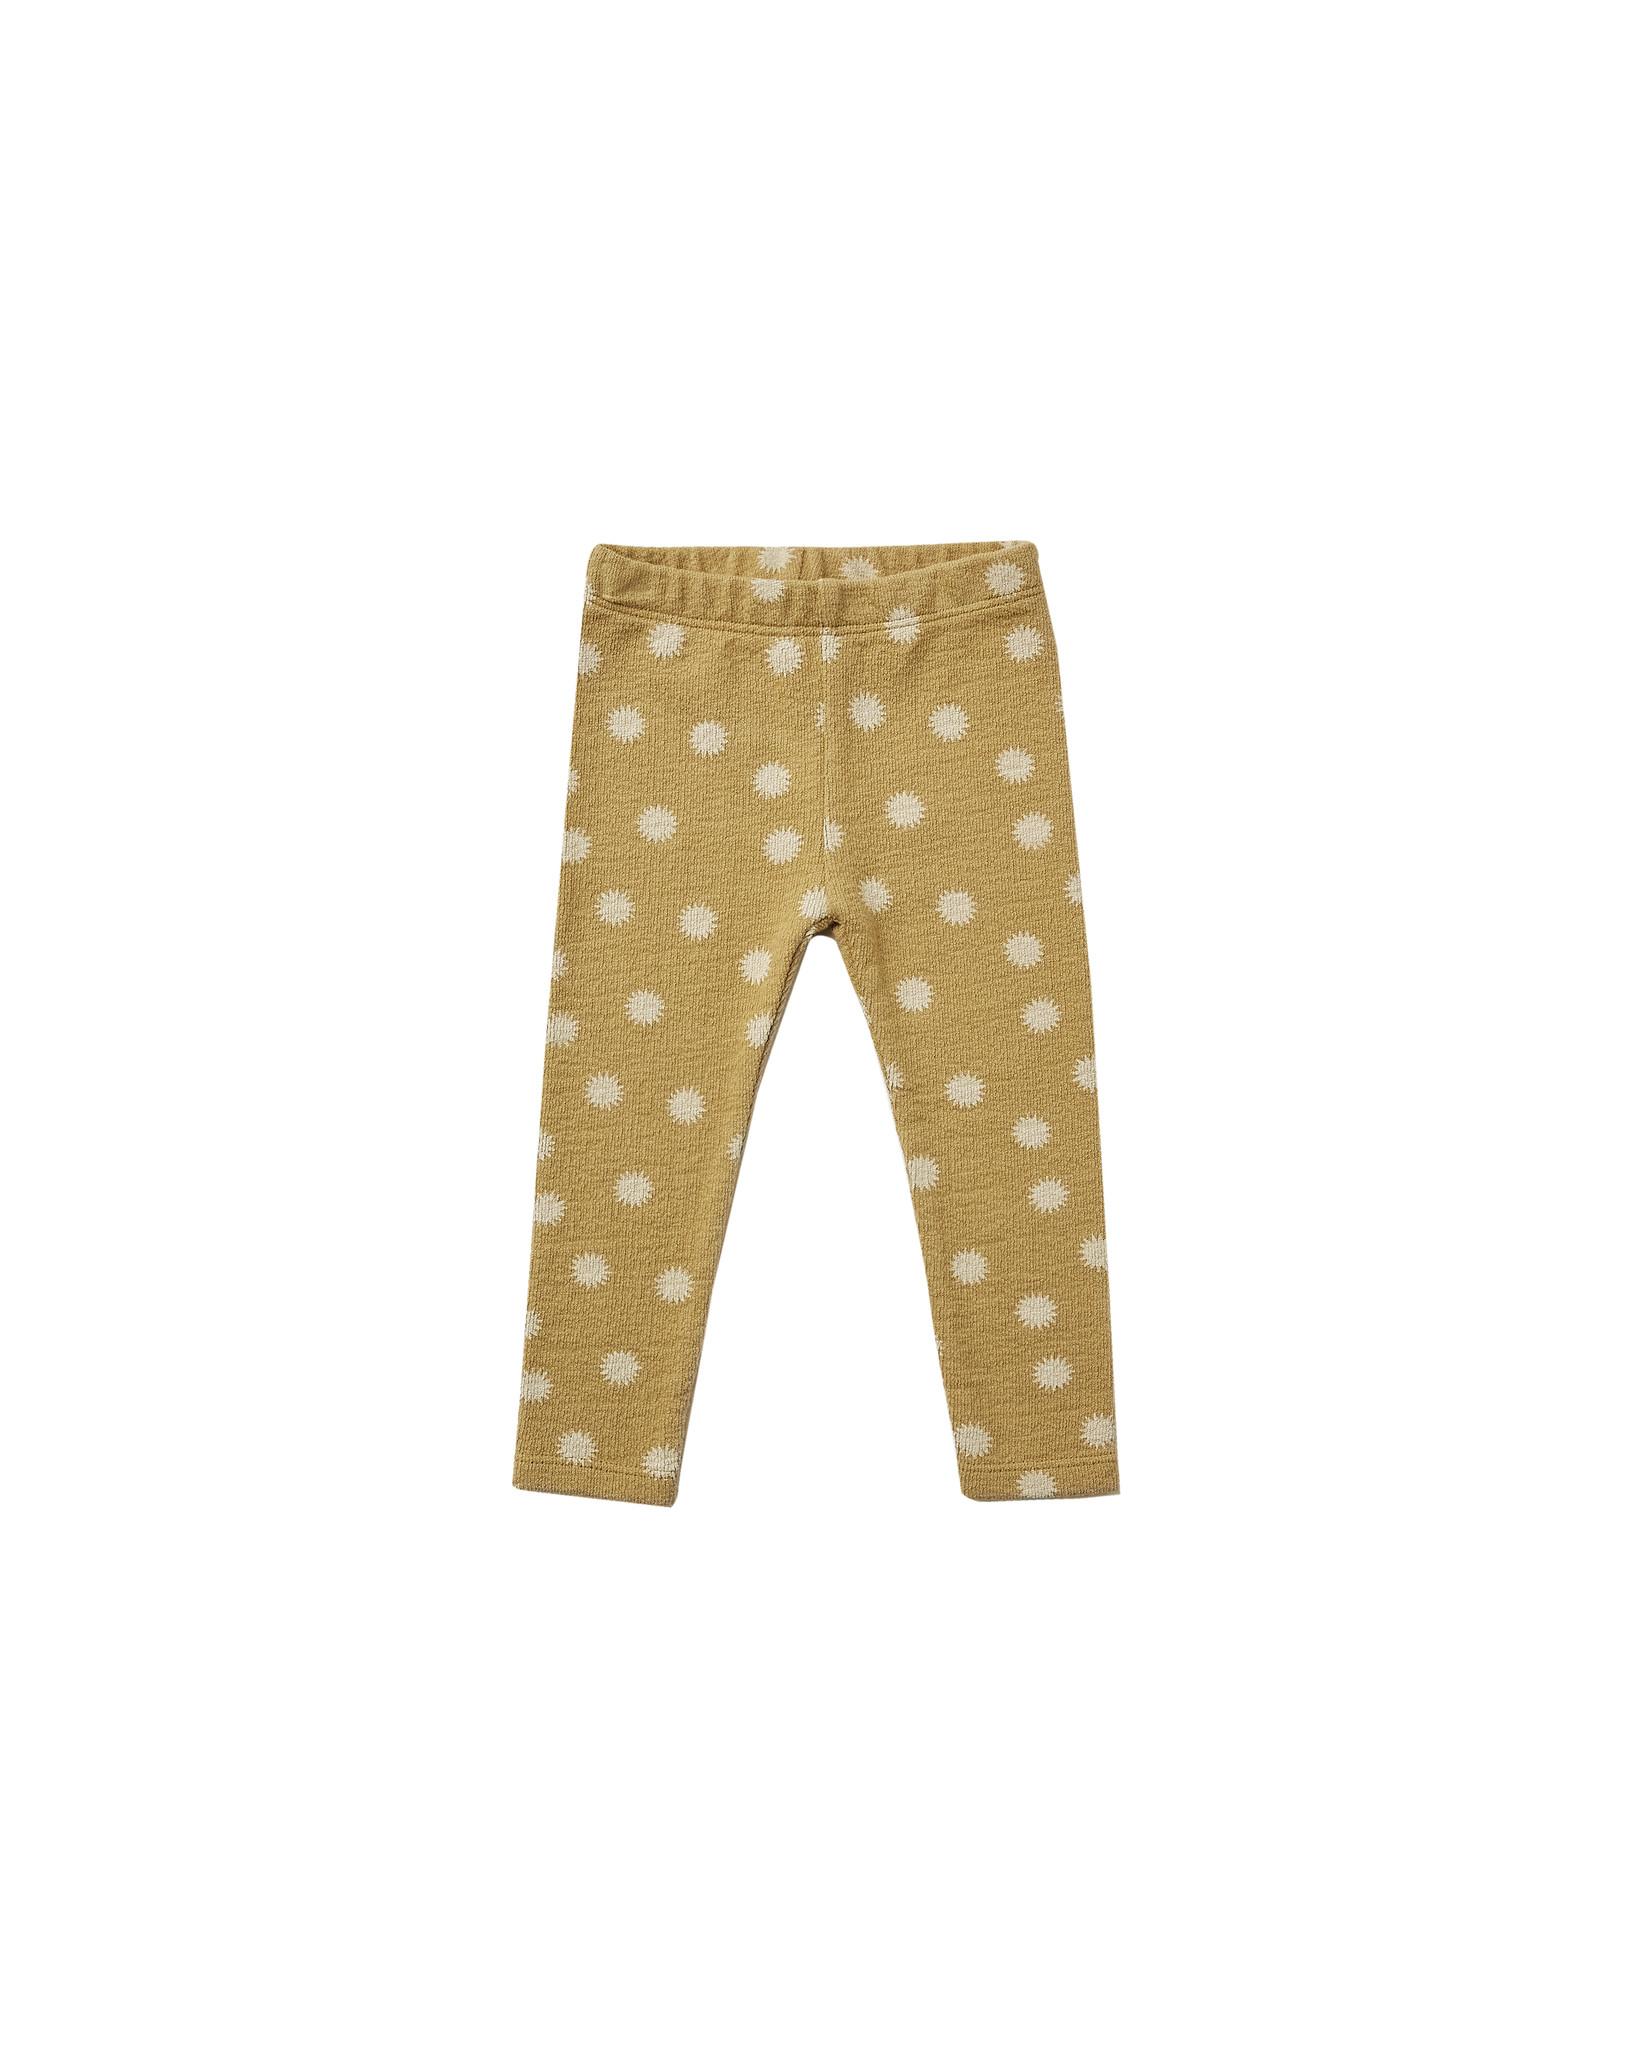 Rylee + Cru - RC RC BA - Sunburst Knit Leggings in Gold